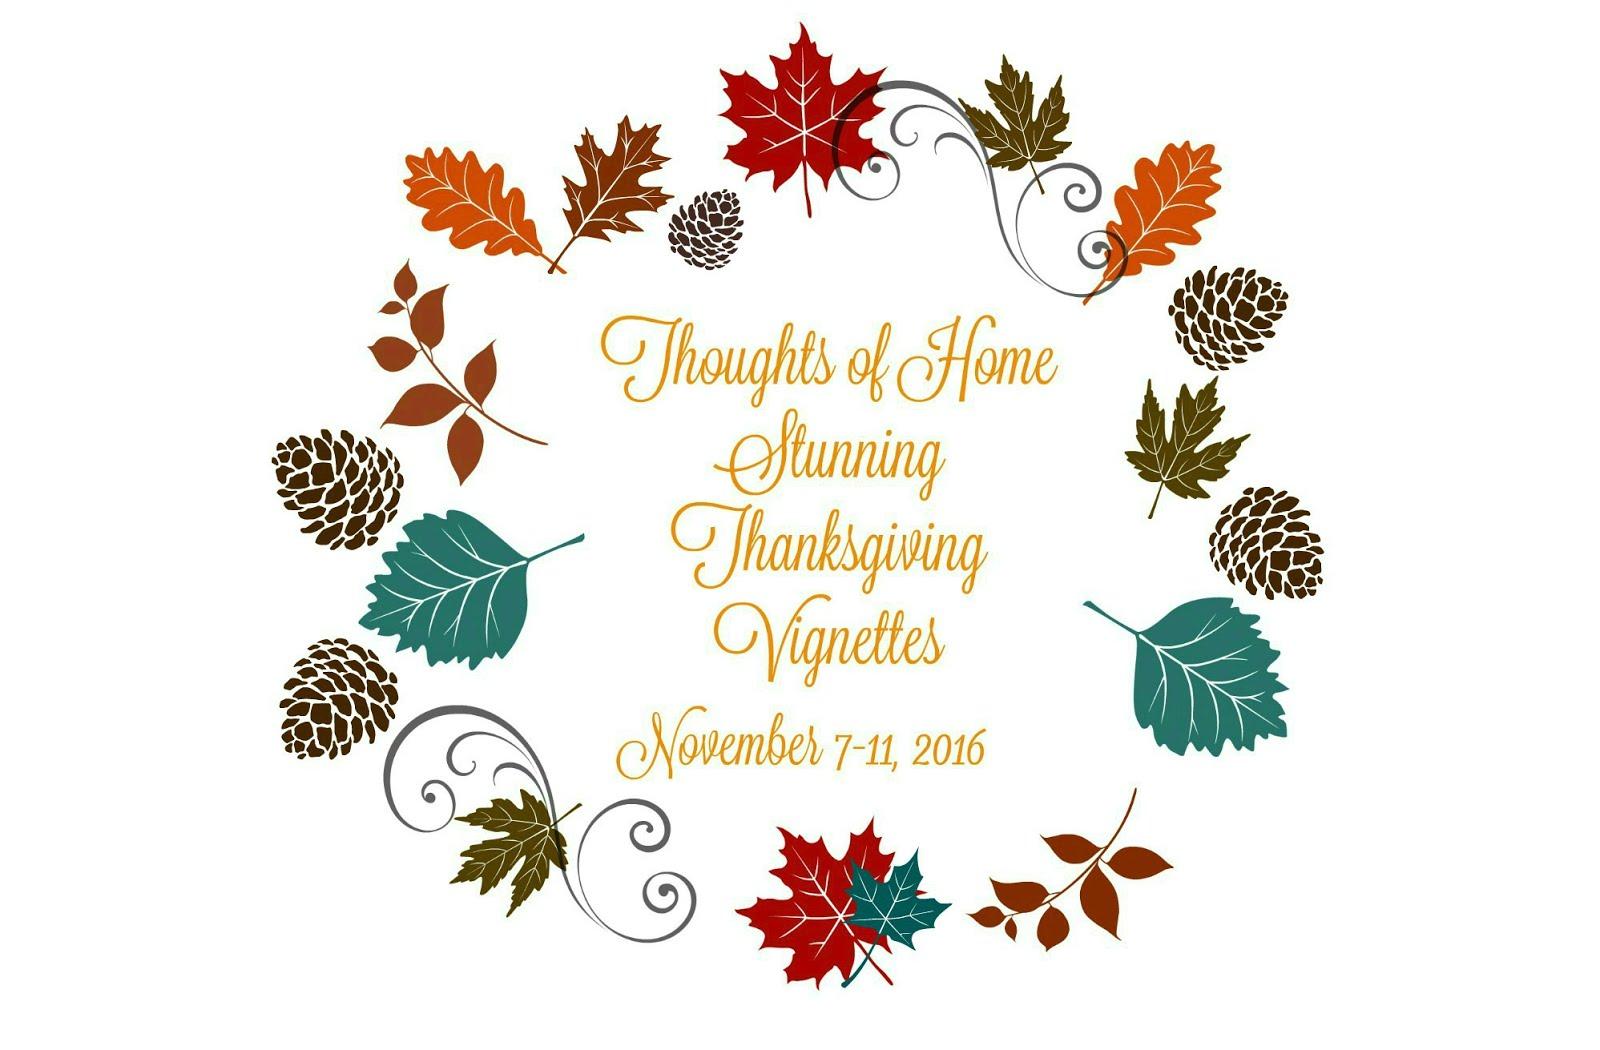 Stunning Thanksgiving Vignettes